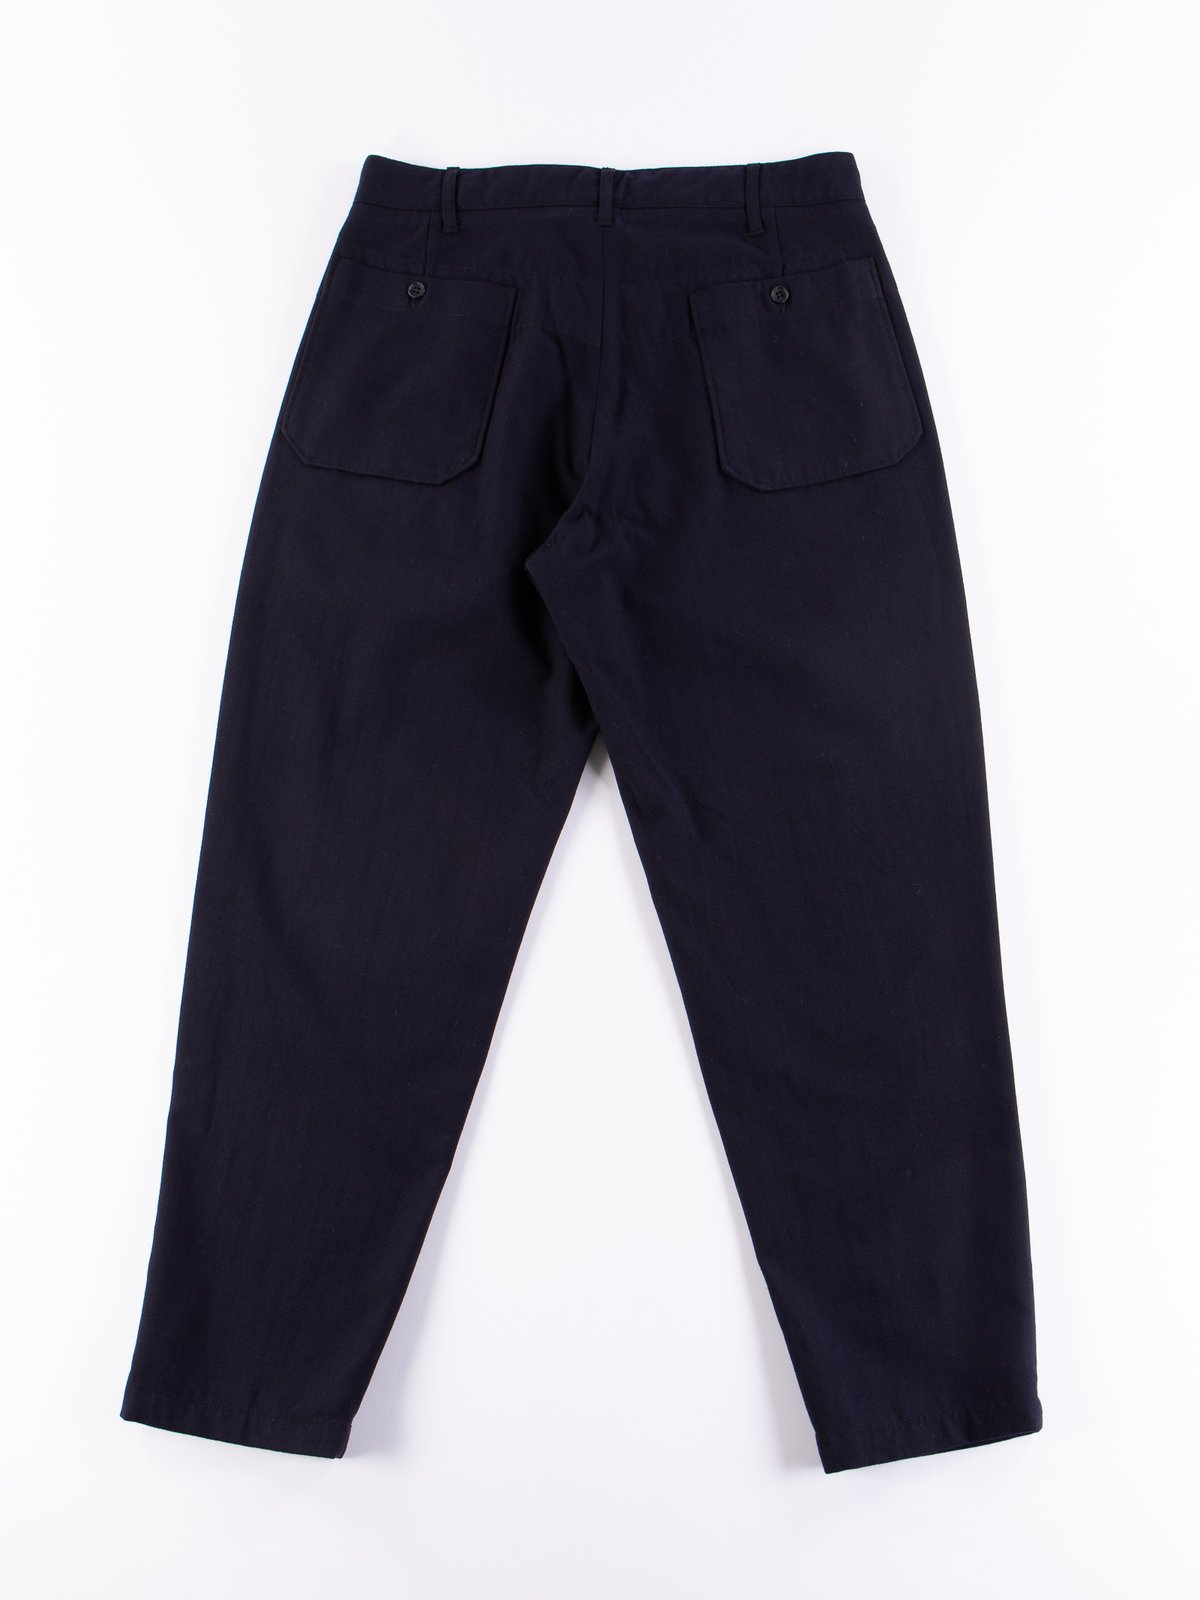 Dark Navy Wool Uniform Serge Carlyle Pant - Image 6